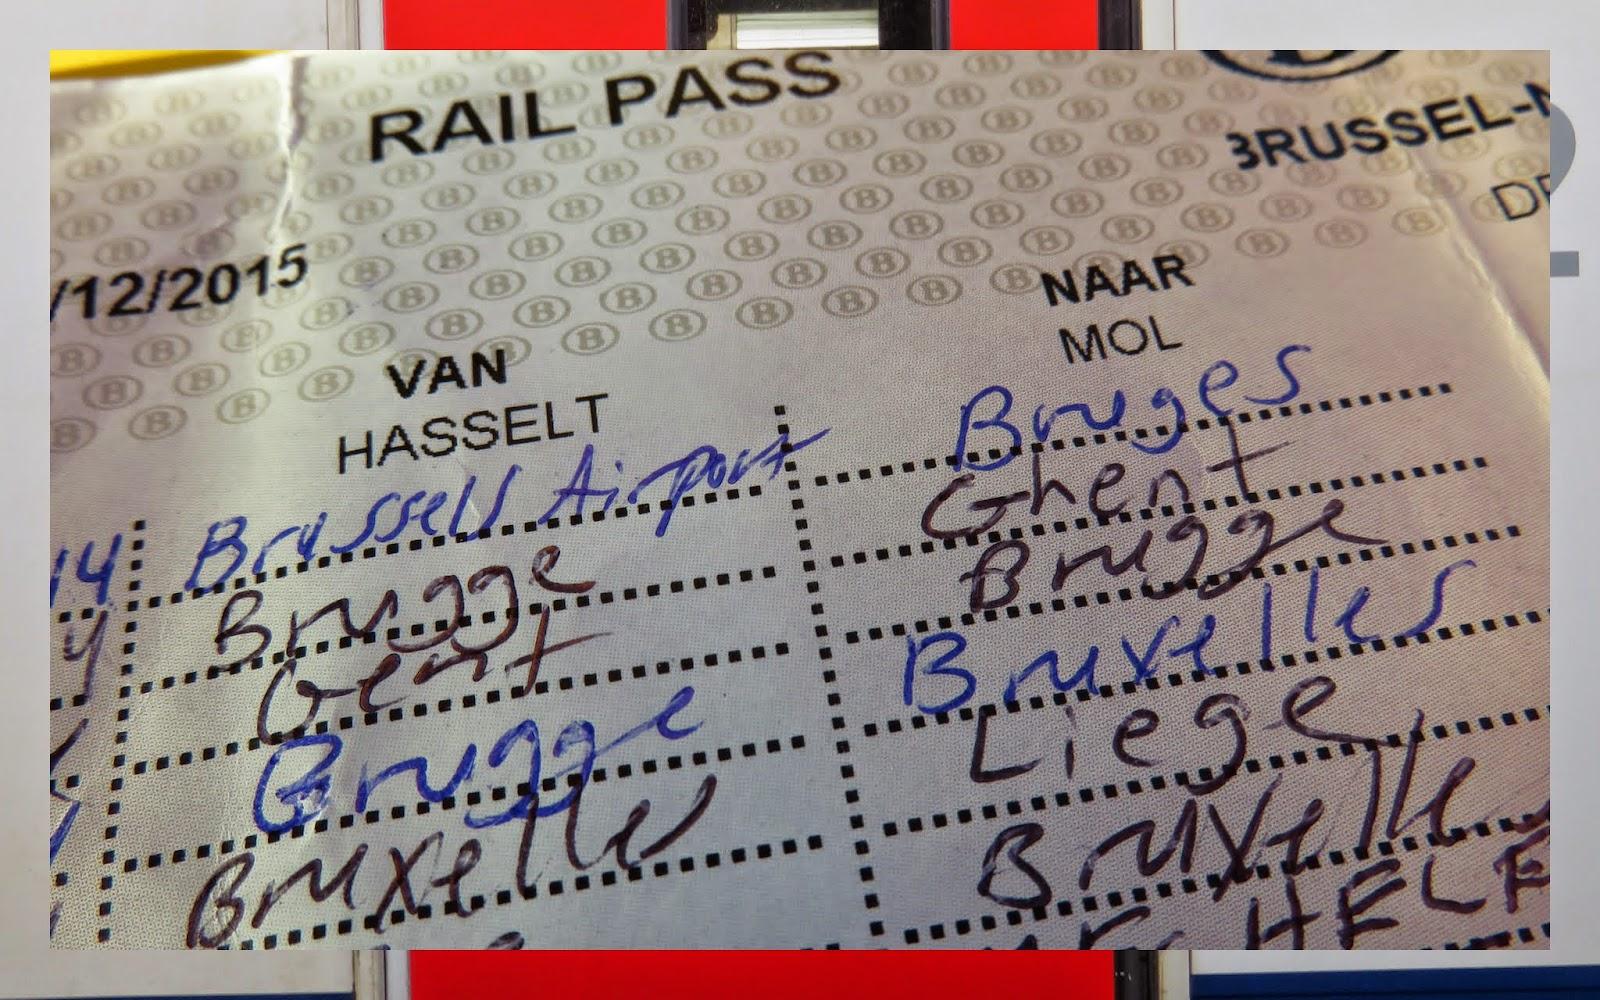 Belgian Rail 10 Trip Train Pass